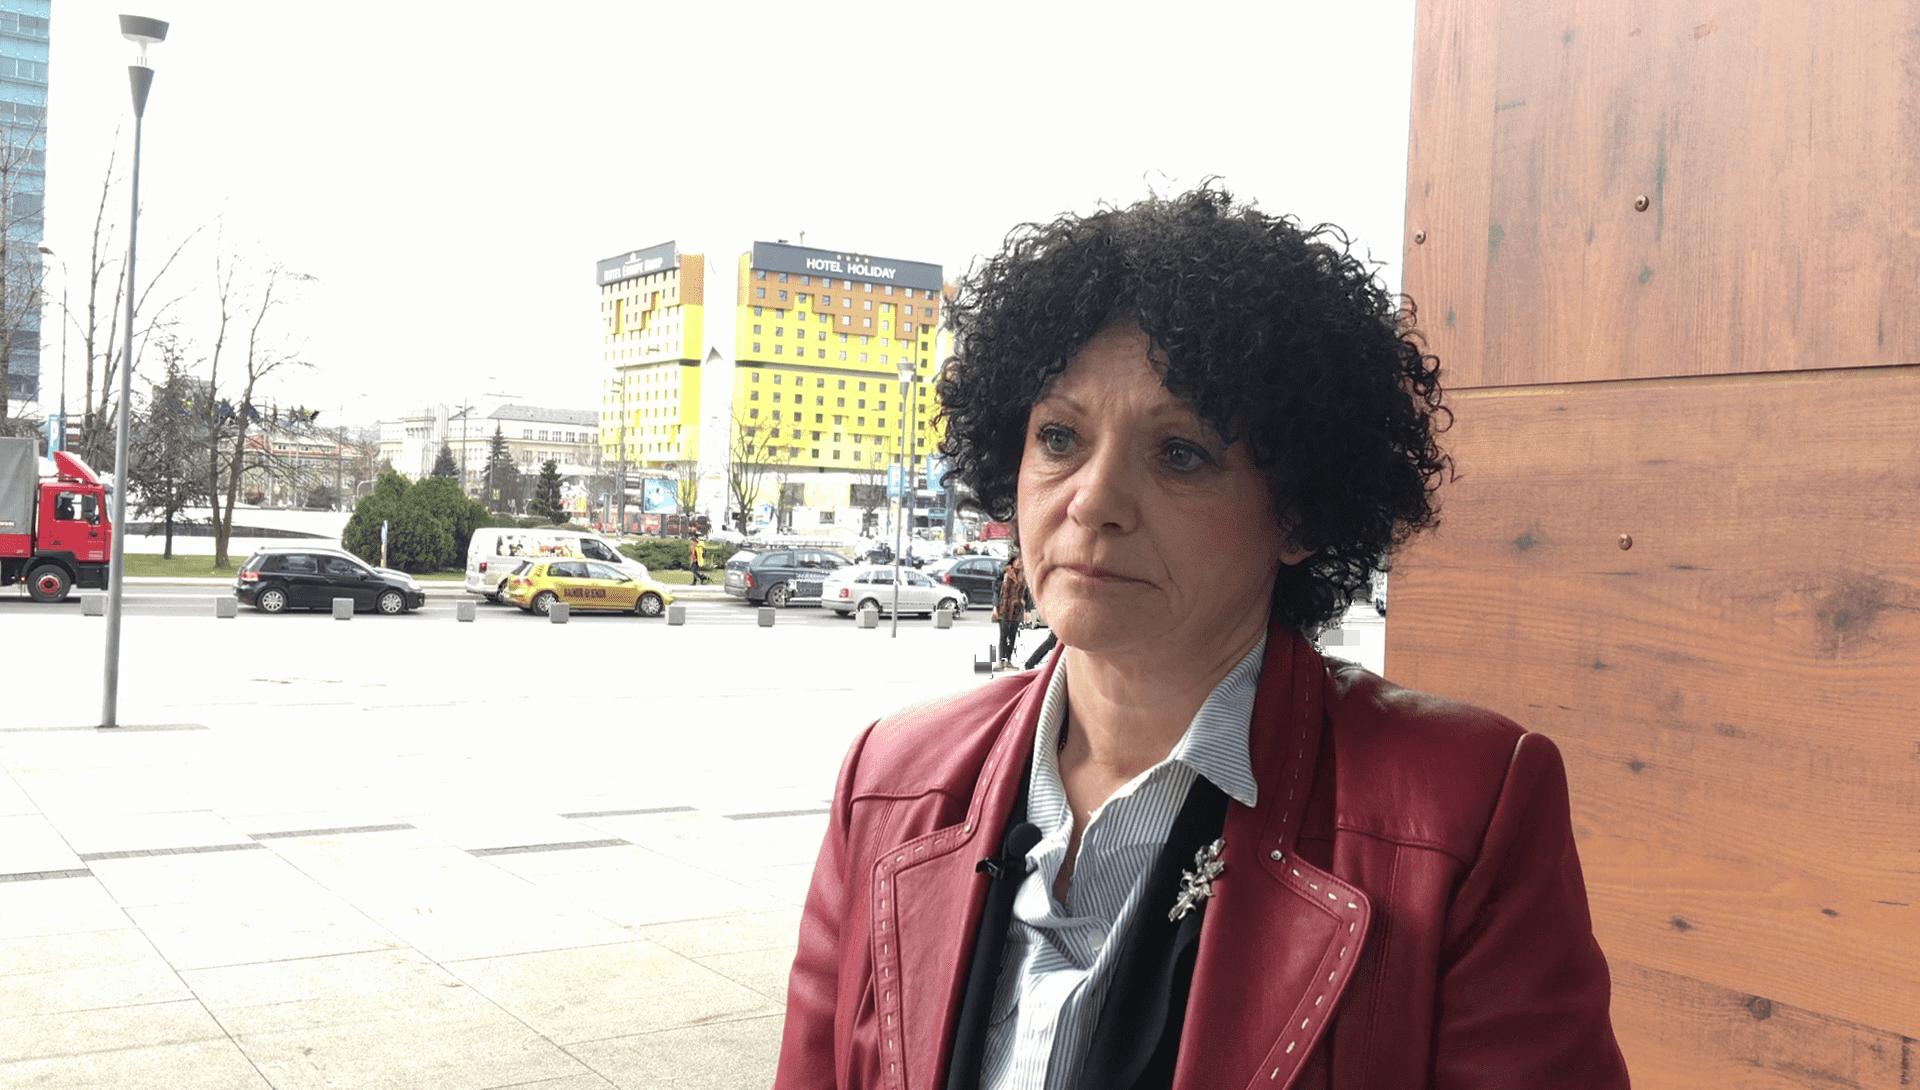 Testifying Against Karadzic: The Witnesses' Stories